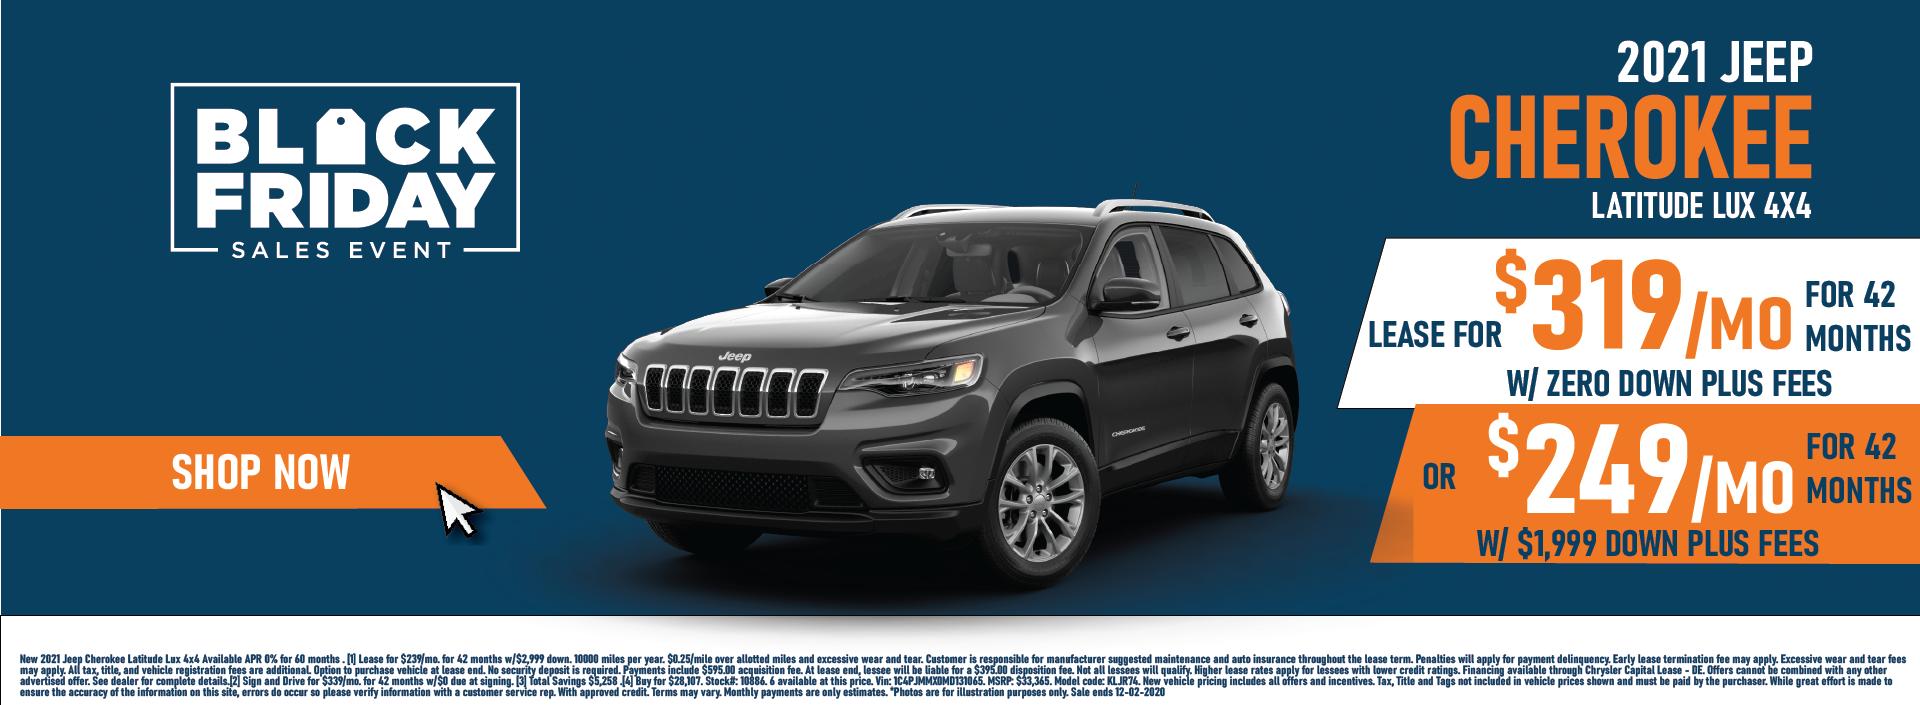 Whitewater – Jeep Cherokee November Updated Again